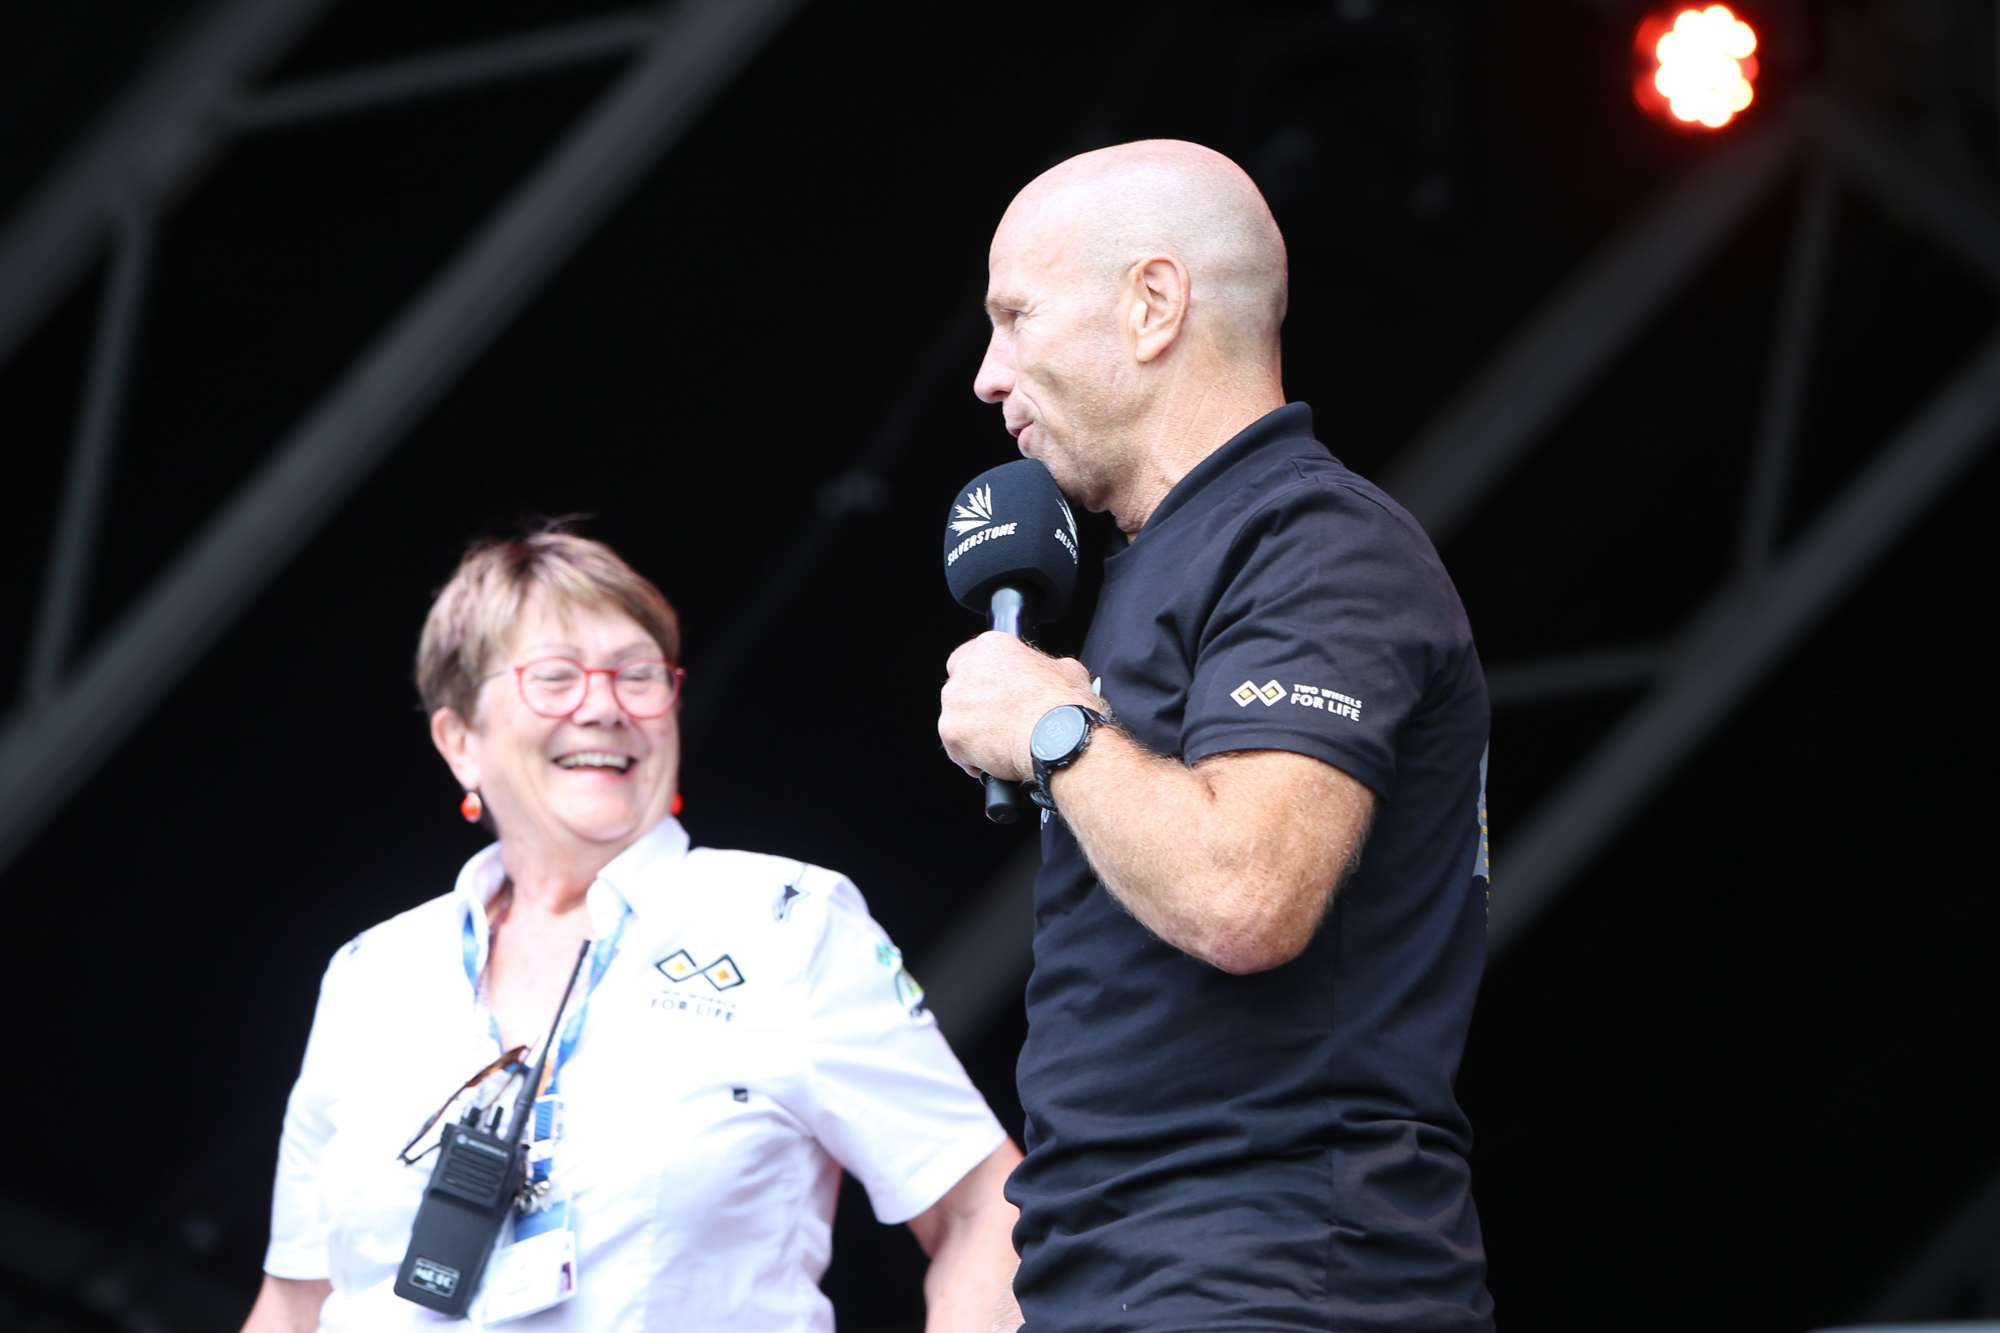 Two Wheels CEO recognised in 'Top Women in Social Enterprise' list